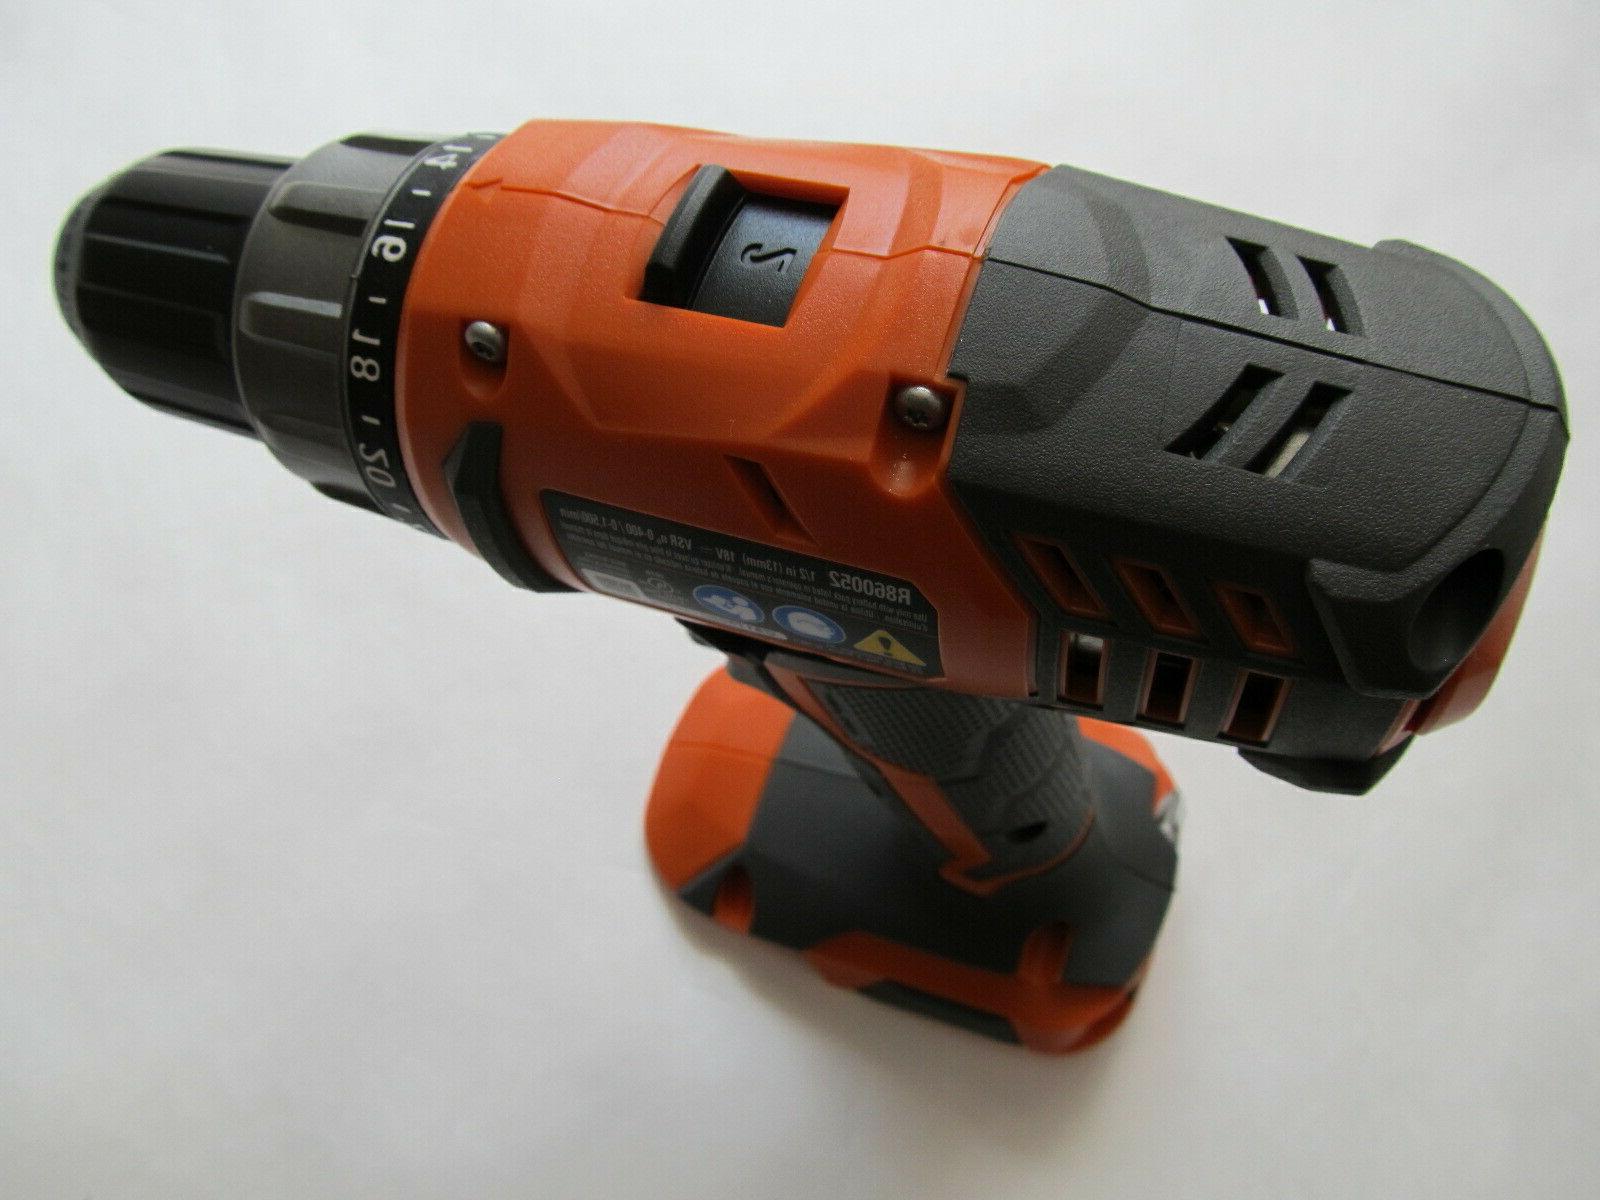 Ridgid R860052 18V Cordless Compact Drill/Driver